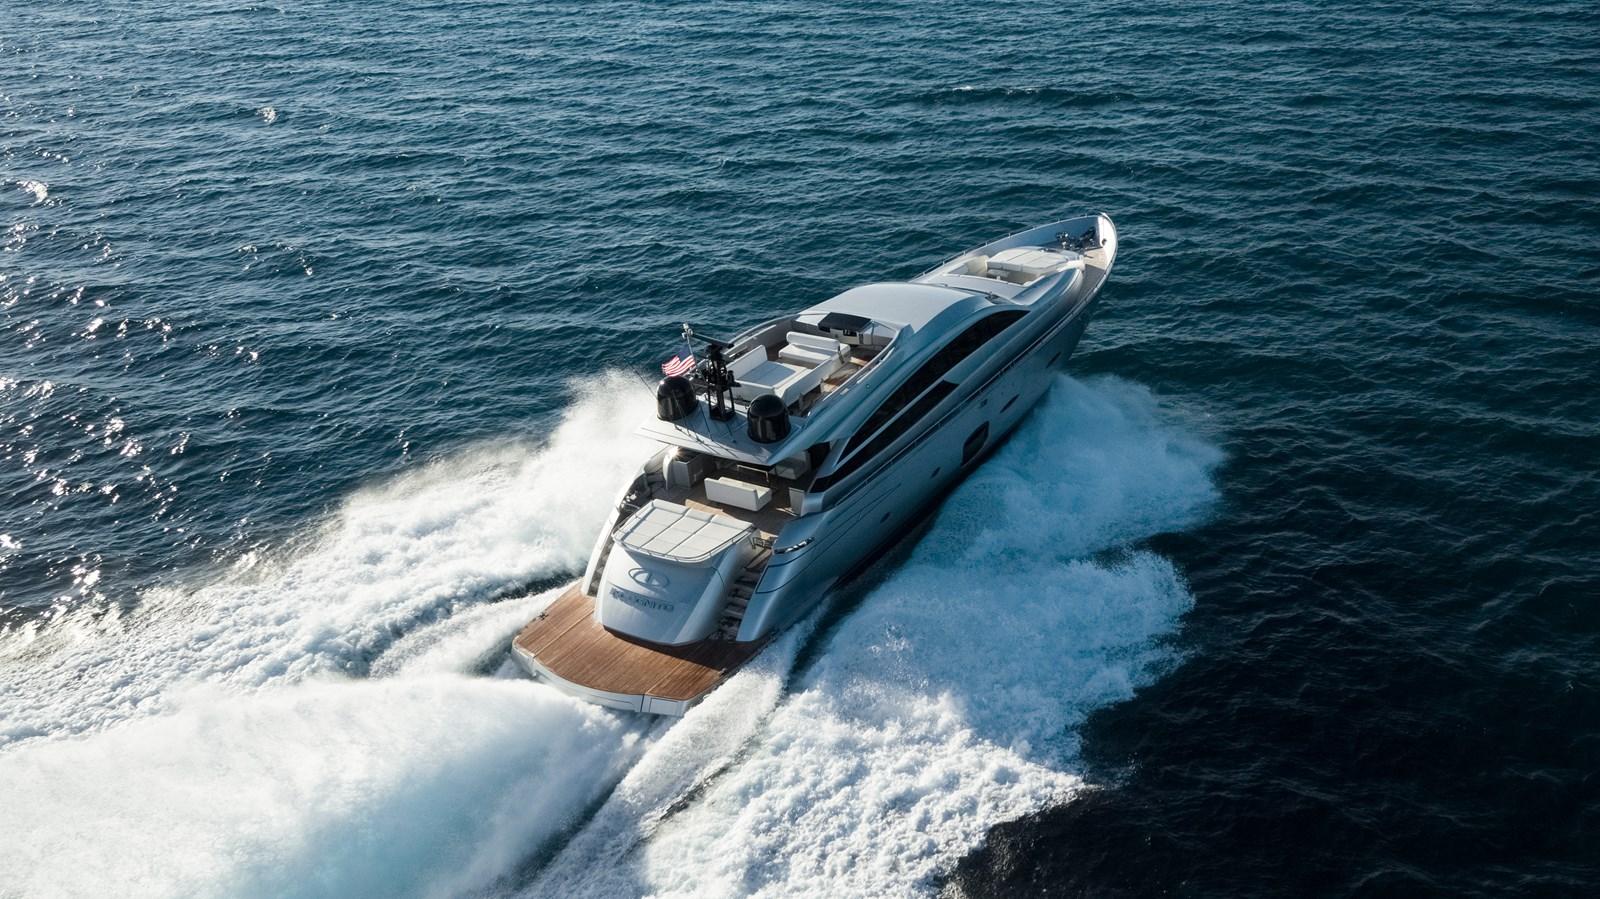 DJI_0015 2012 PERSHING  Motor Yacht 2810223